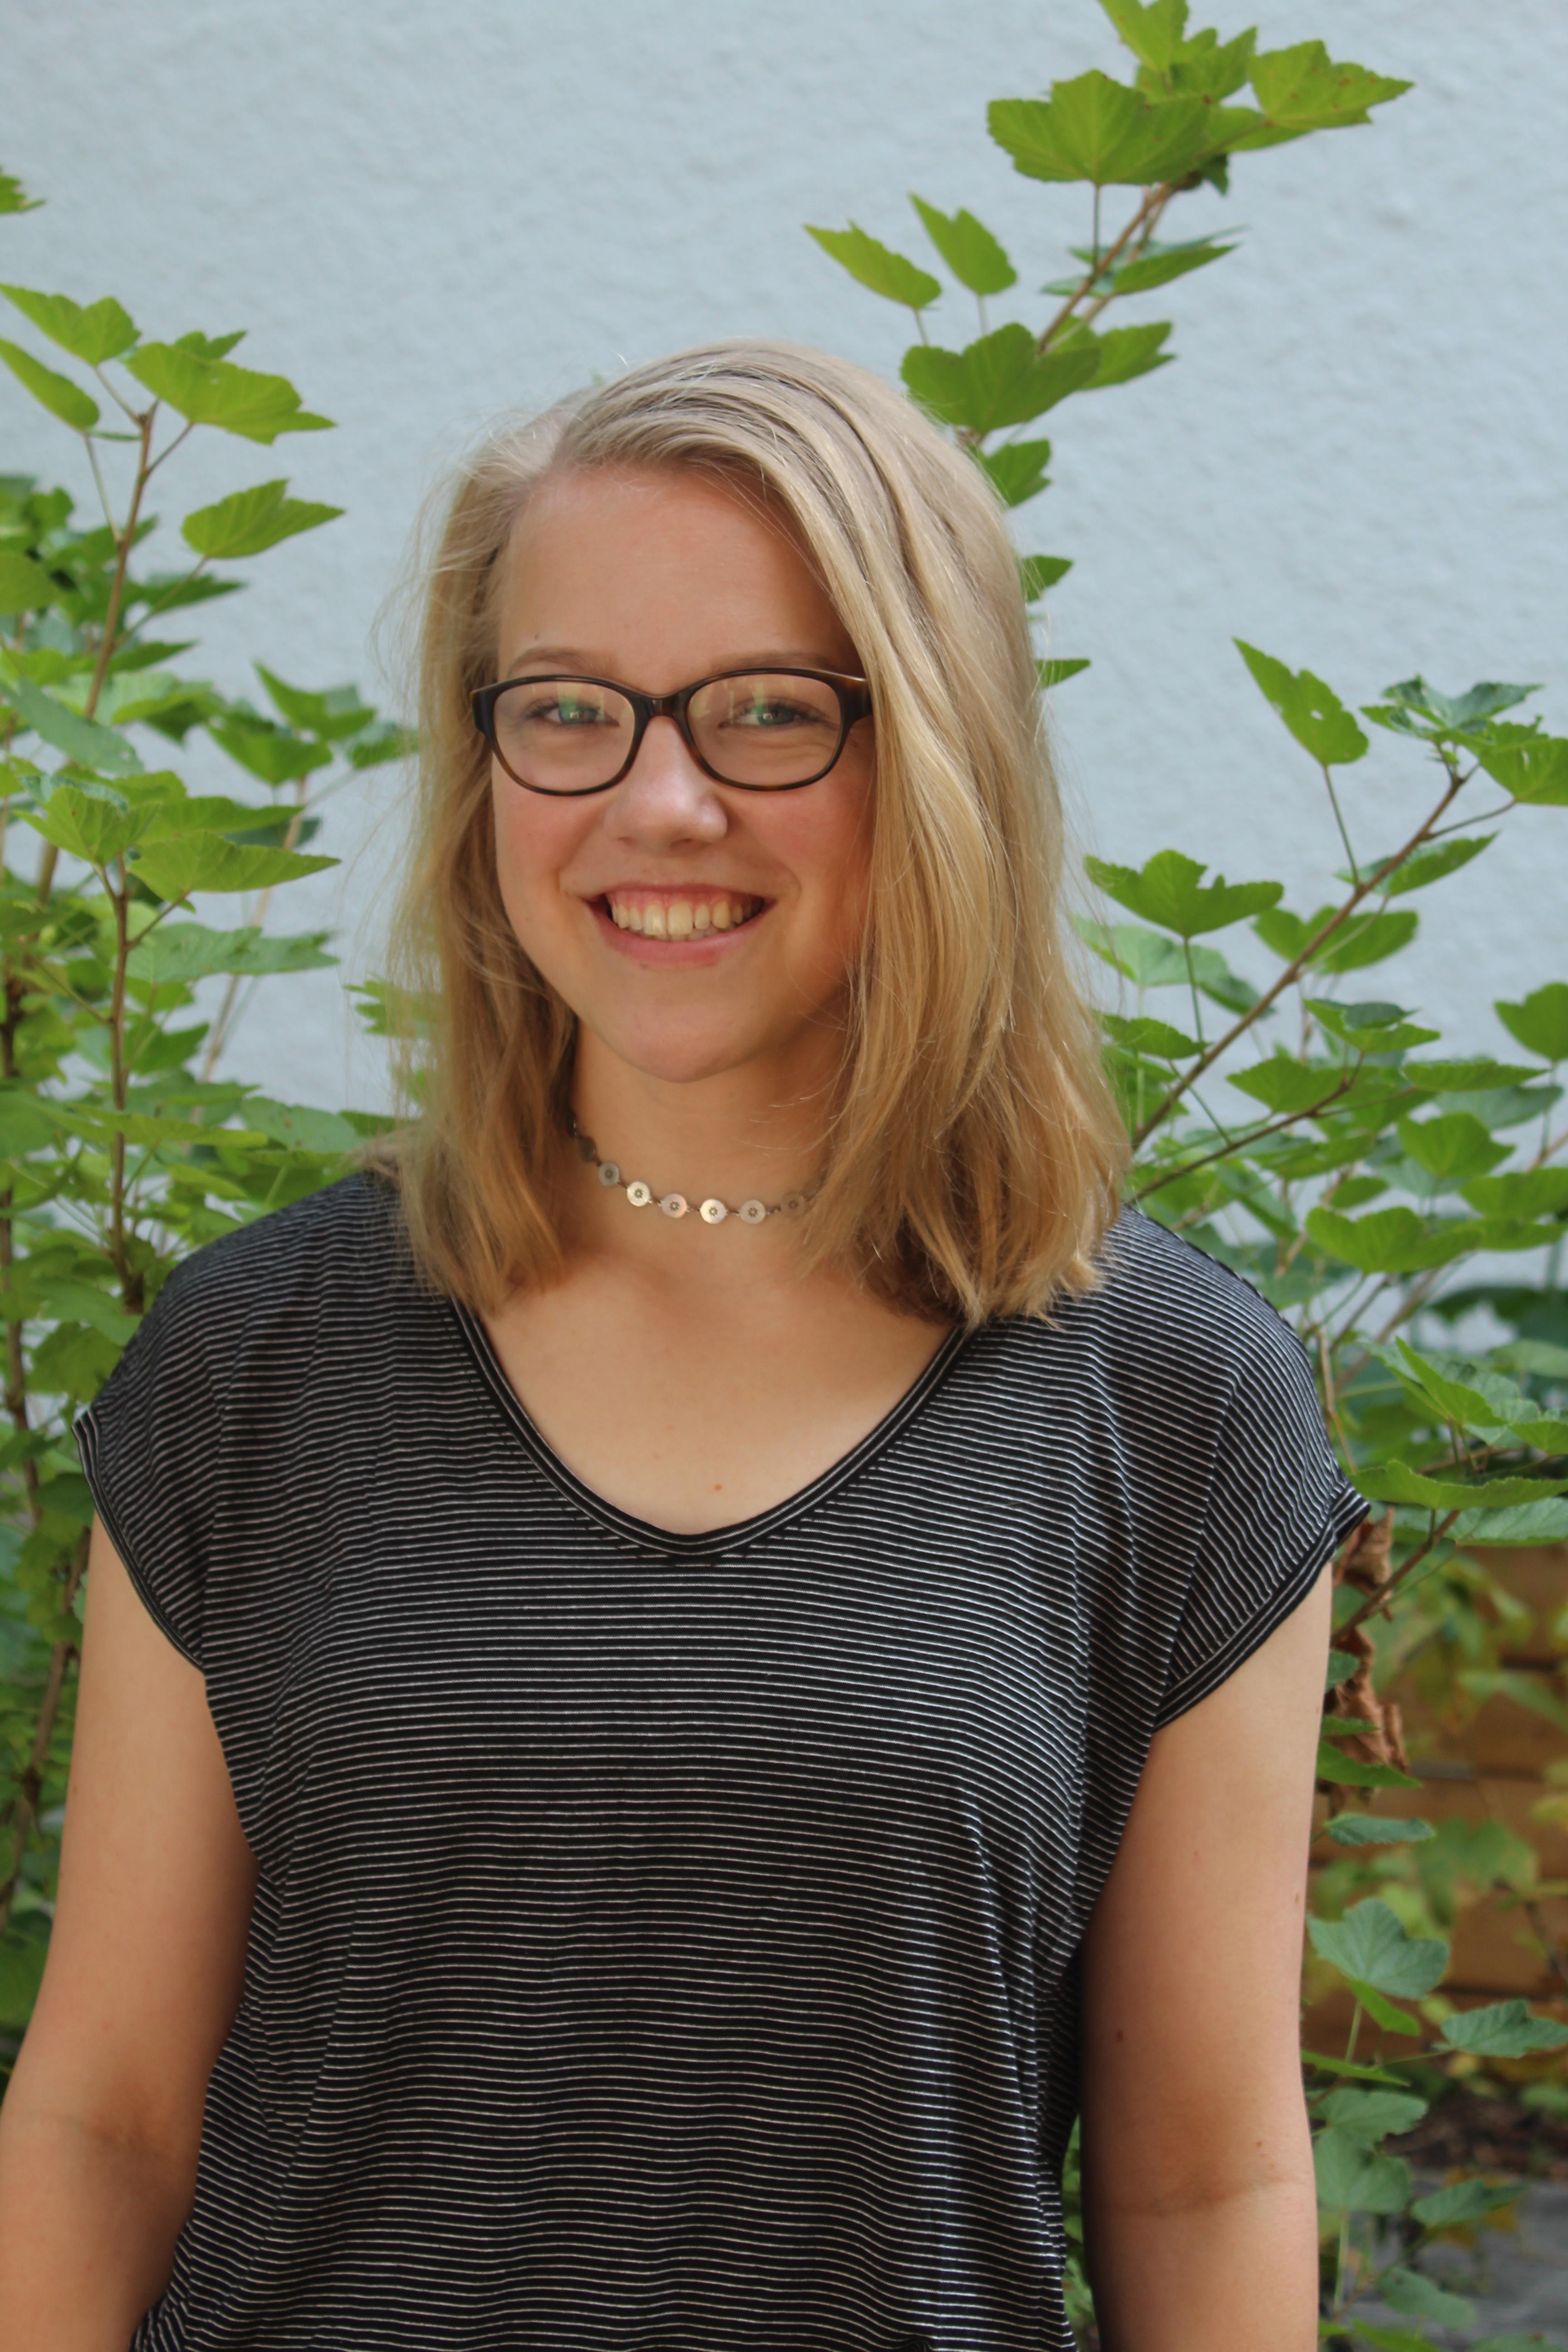 Anna Depenbrock - CL - Fundaciòn Estudio para un Hermano Educere